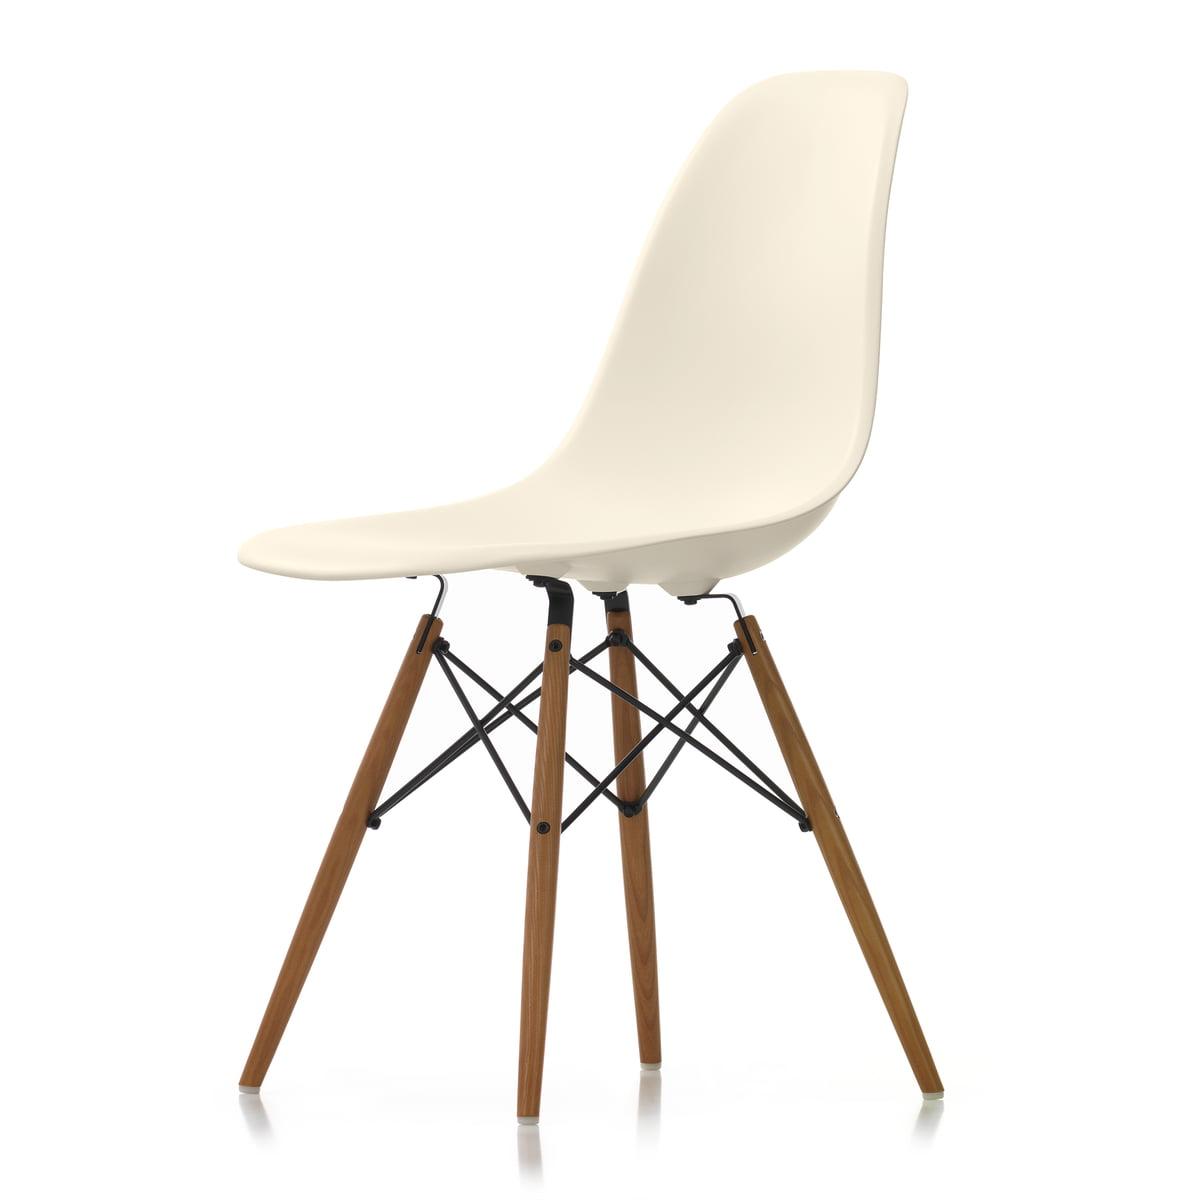 Vitra - Eames Plastic Side Chair DSW (H 43 cm), frêne miel / crème, patins feutres blanc